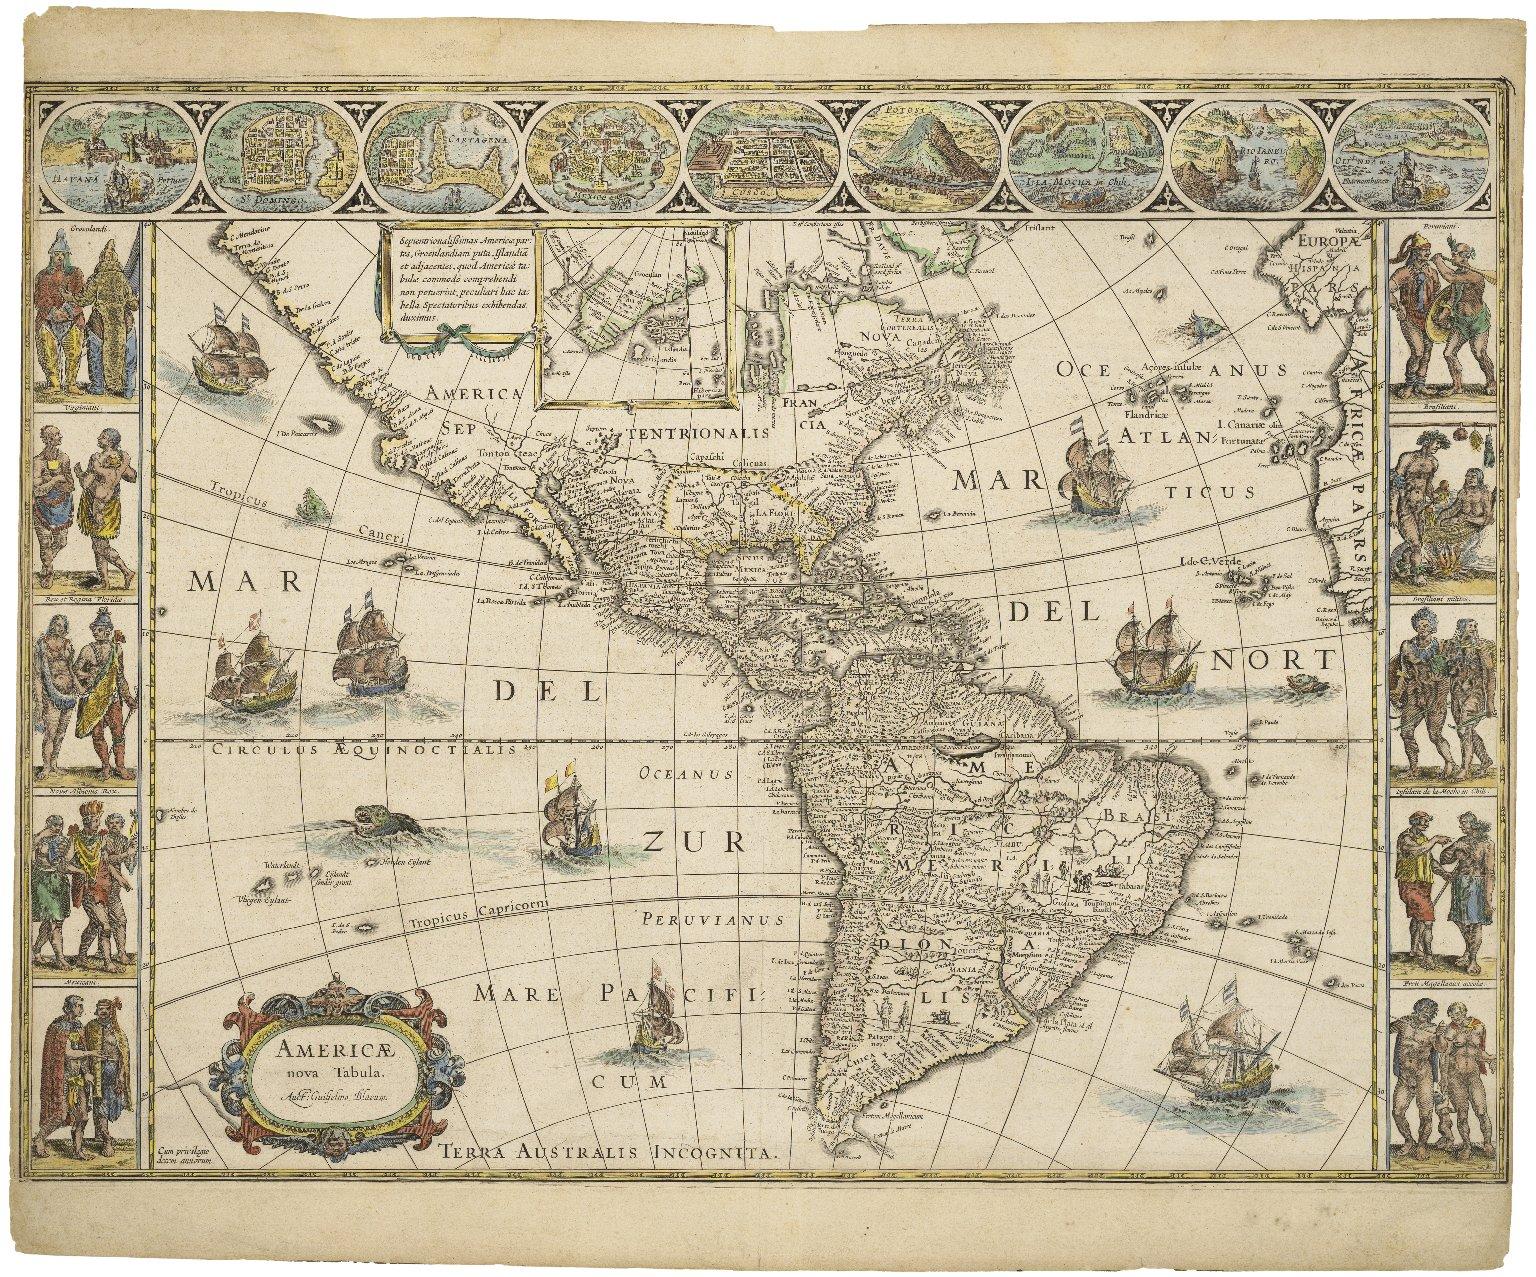 Americae nova tabula [map]